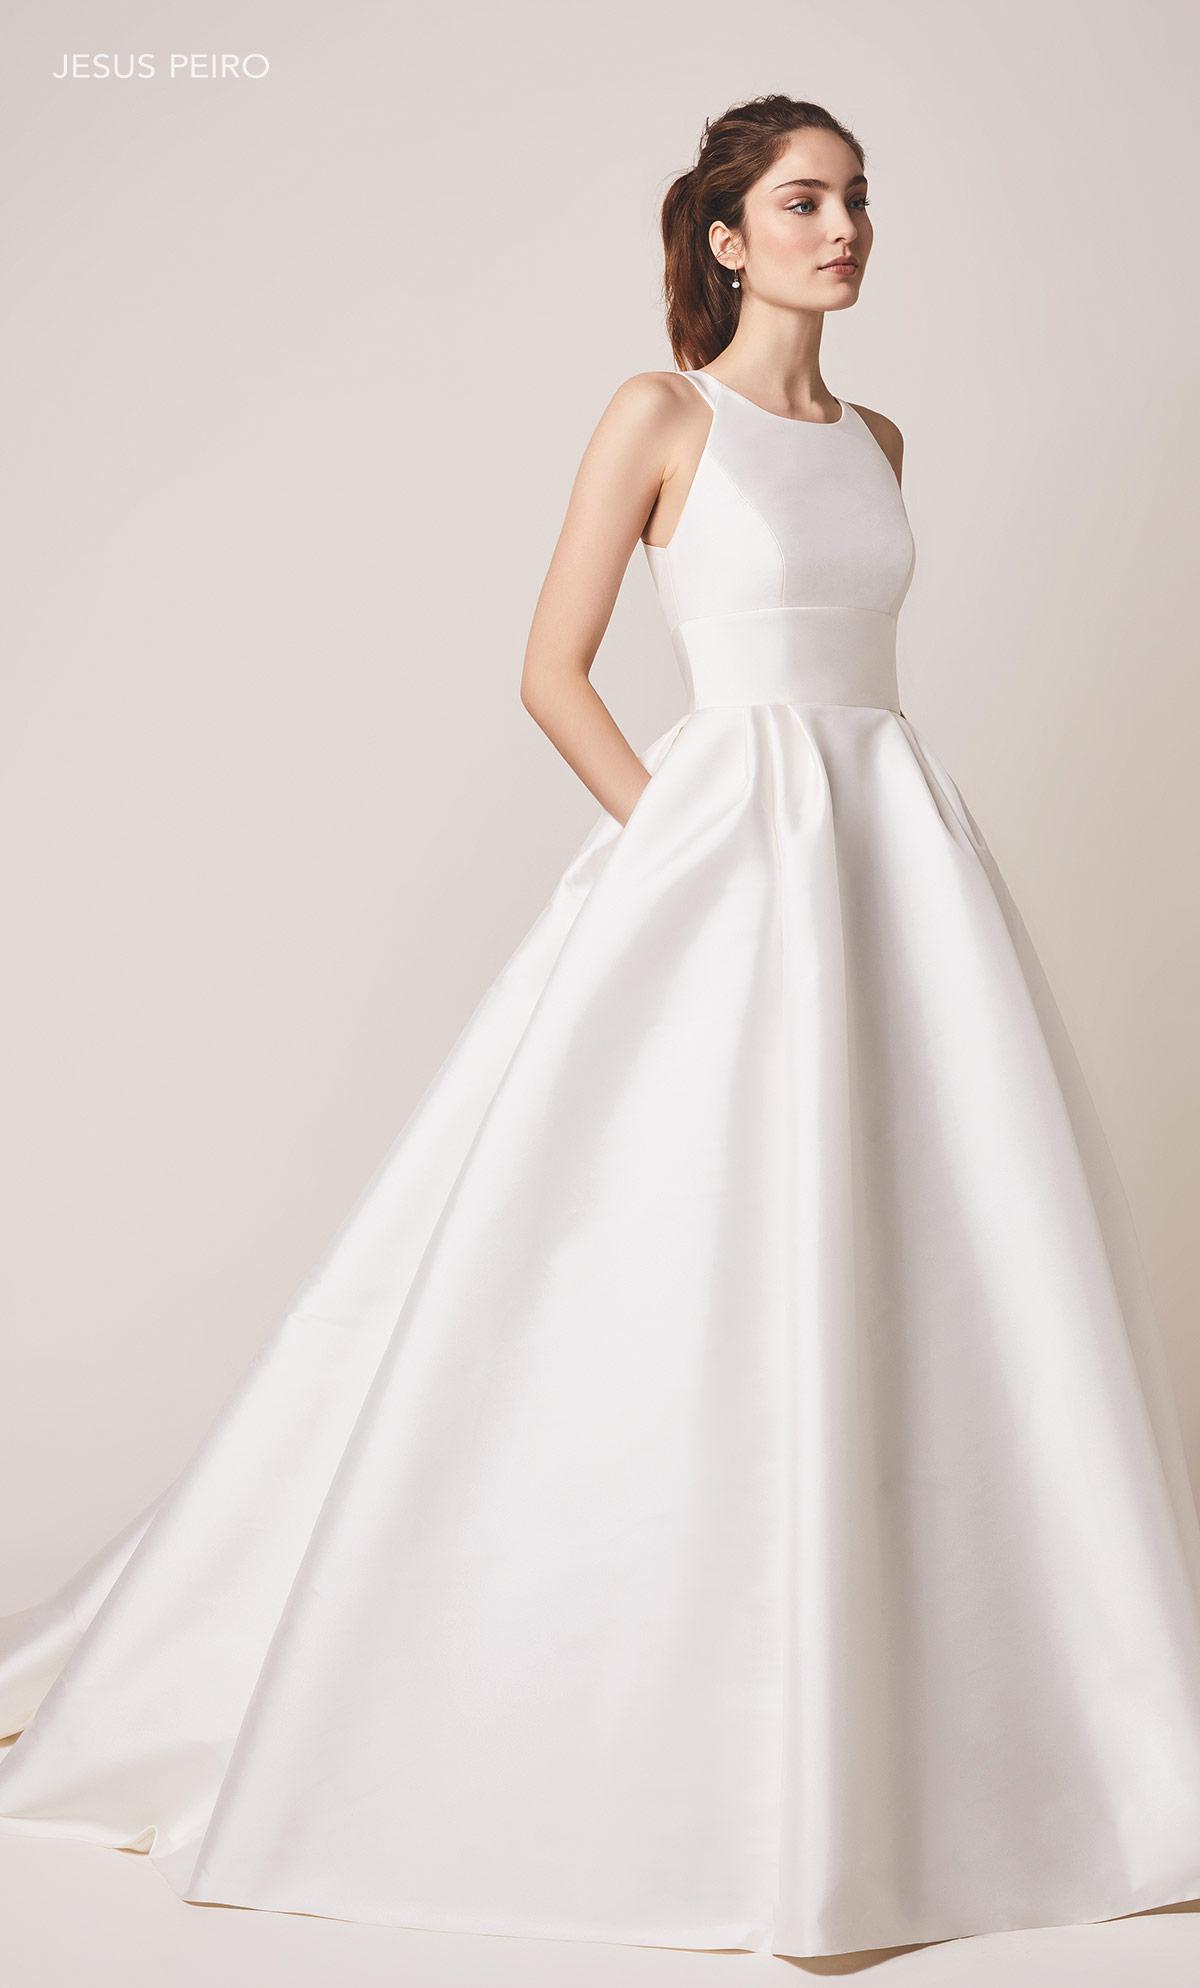 Vestido novia Jesús Peiró Ref.166